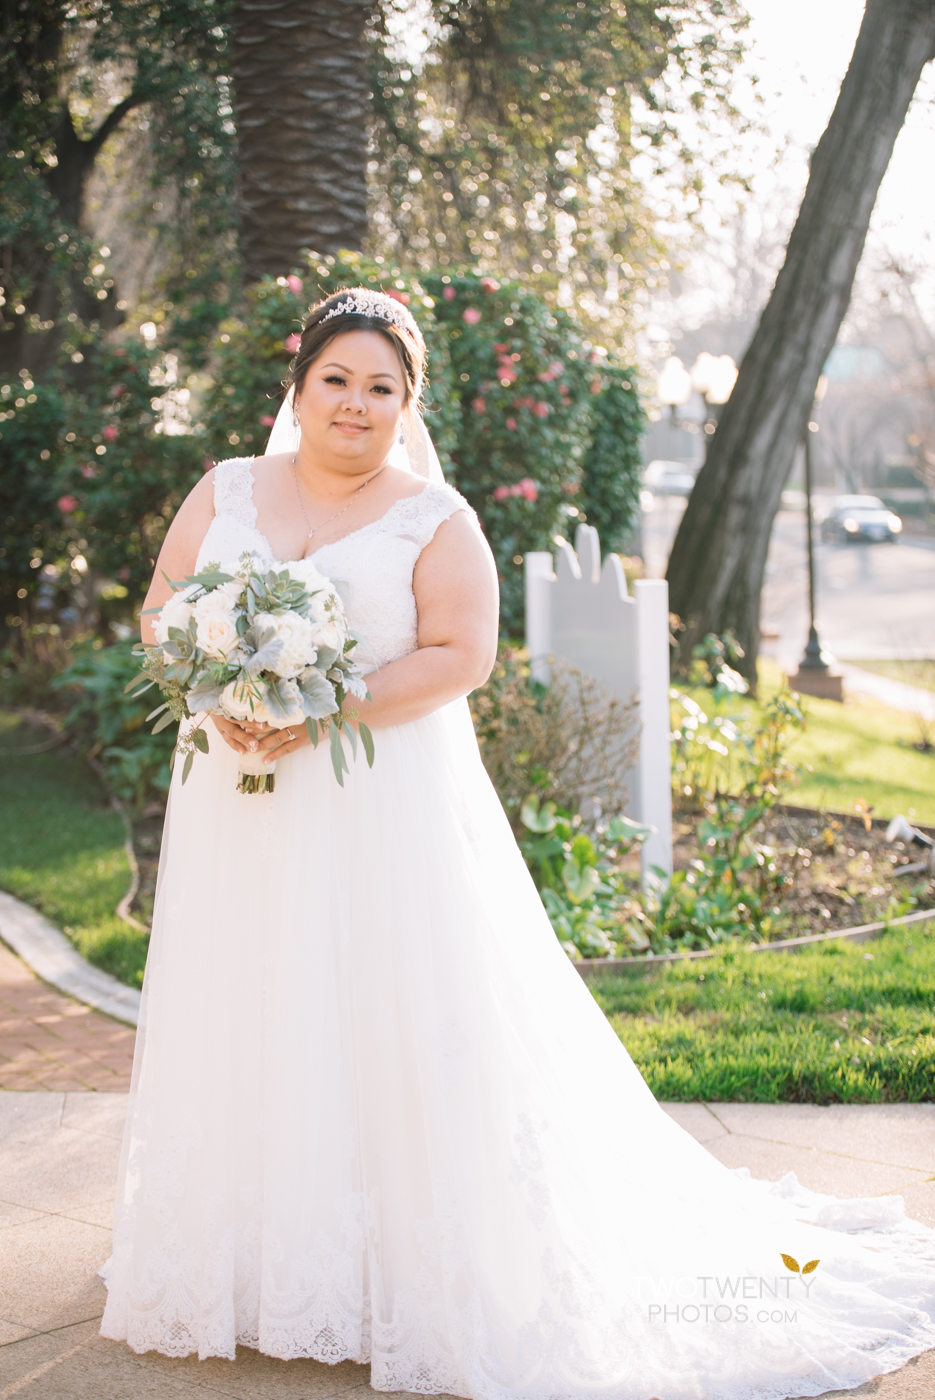 vizcaya-pavilion-sacramento-wedding-photographer-17